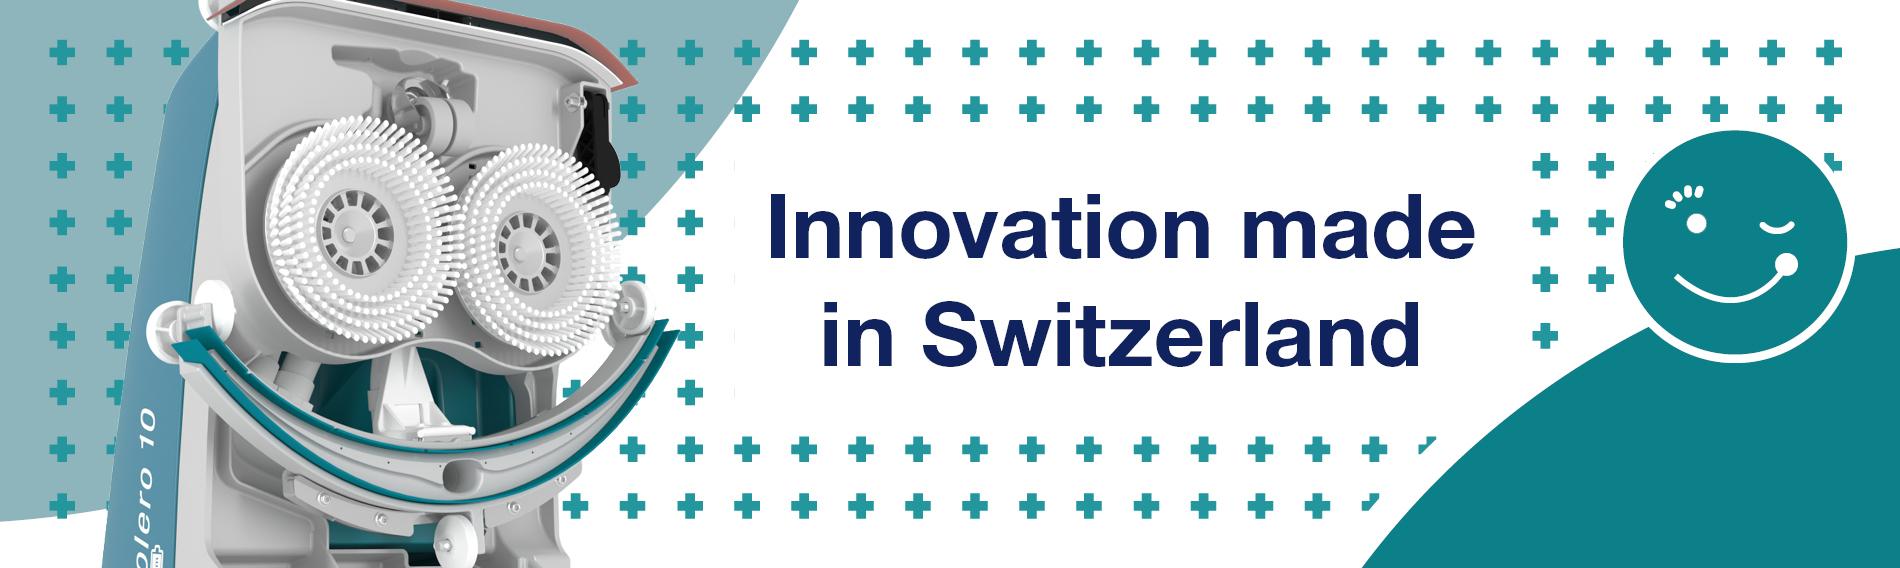 Innovation made in Switzerland